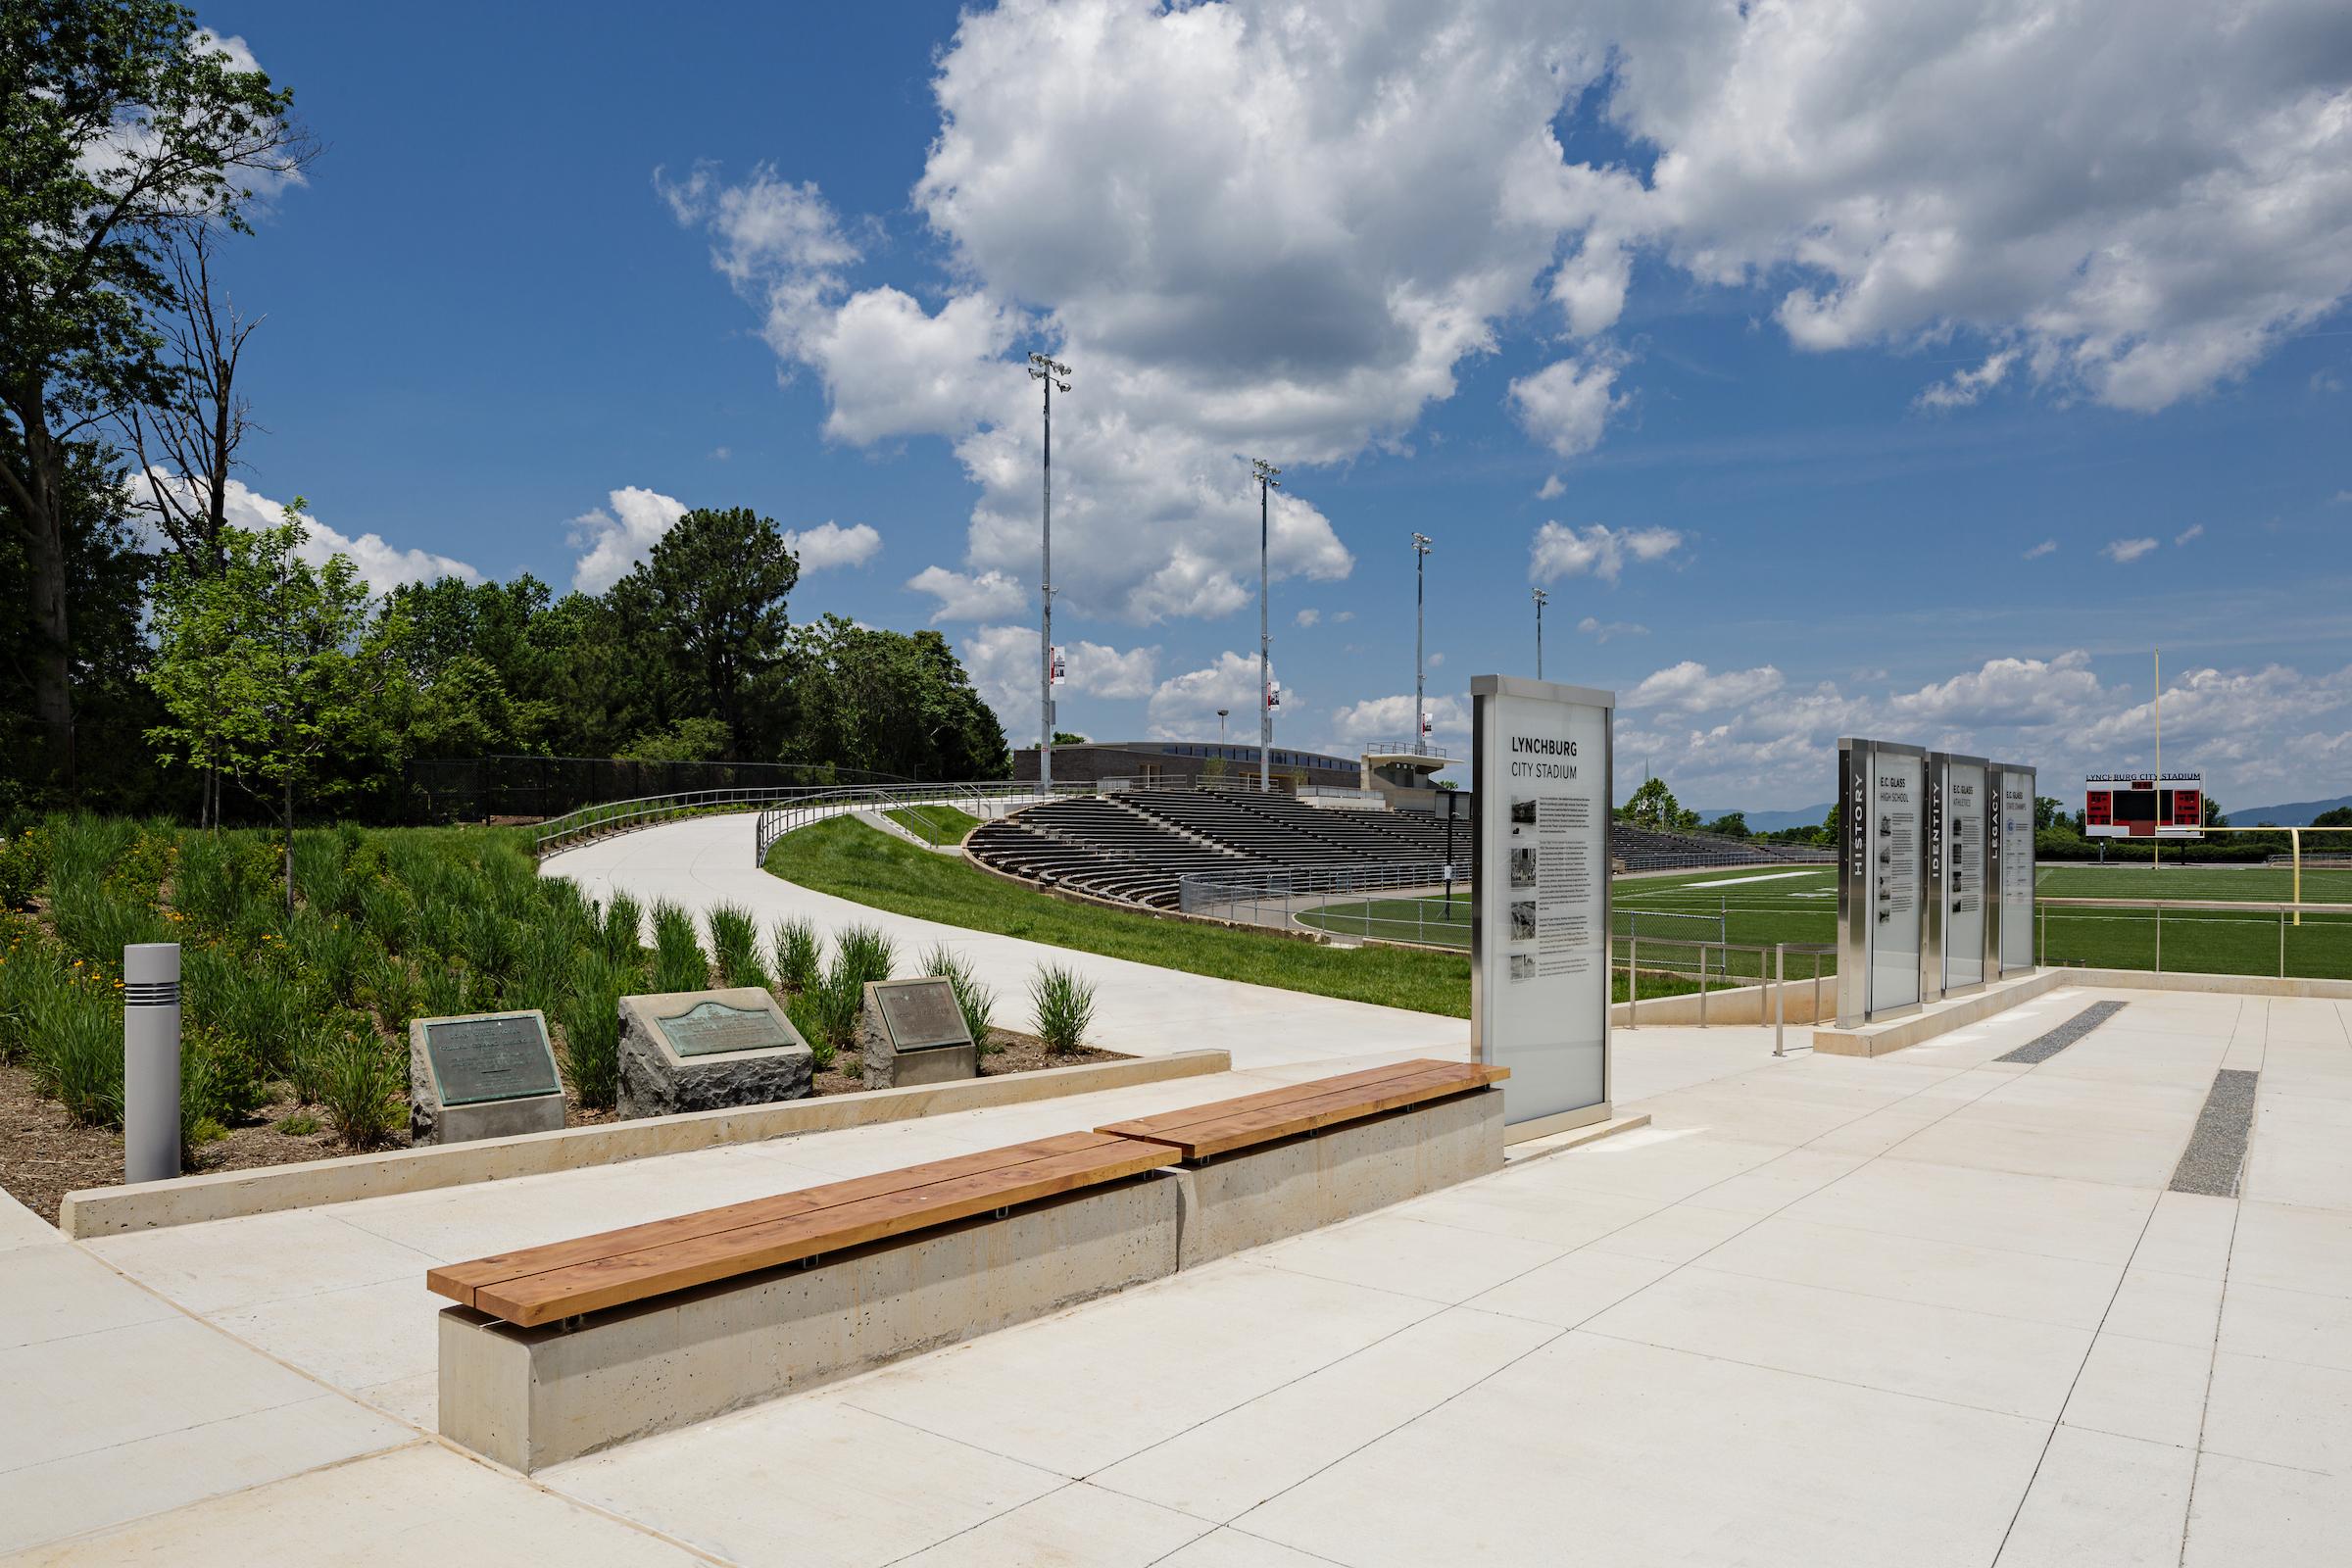 Lynchburg_City_Stadium_3